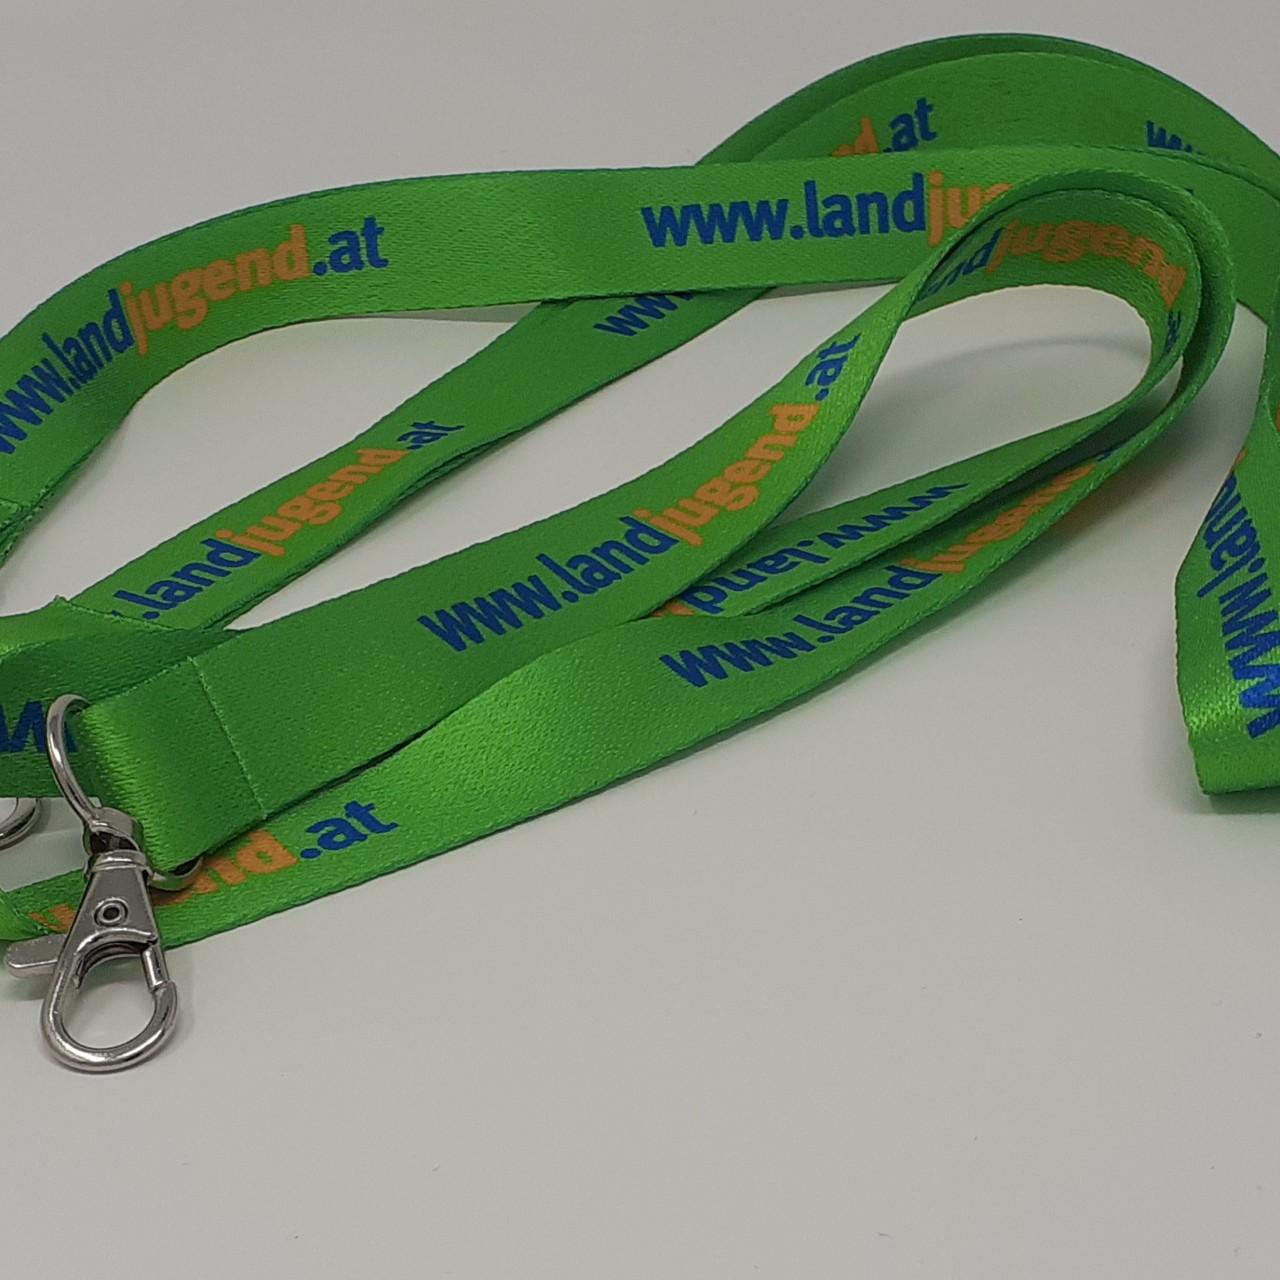 landjugend-oe-1-1280x1280-crop-50-50.jpg